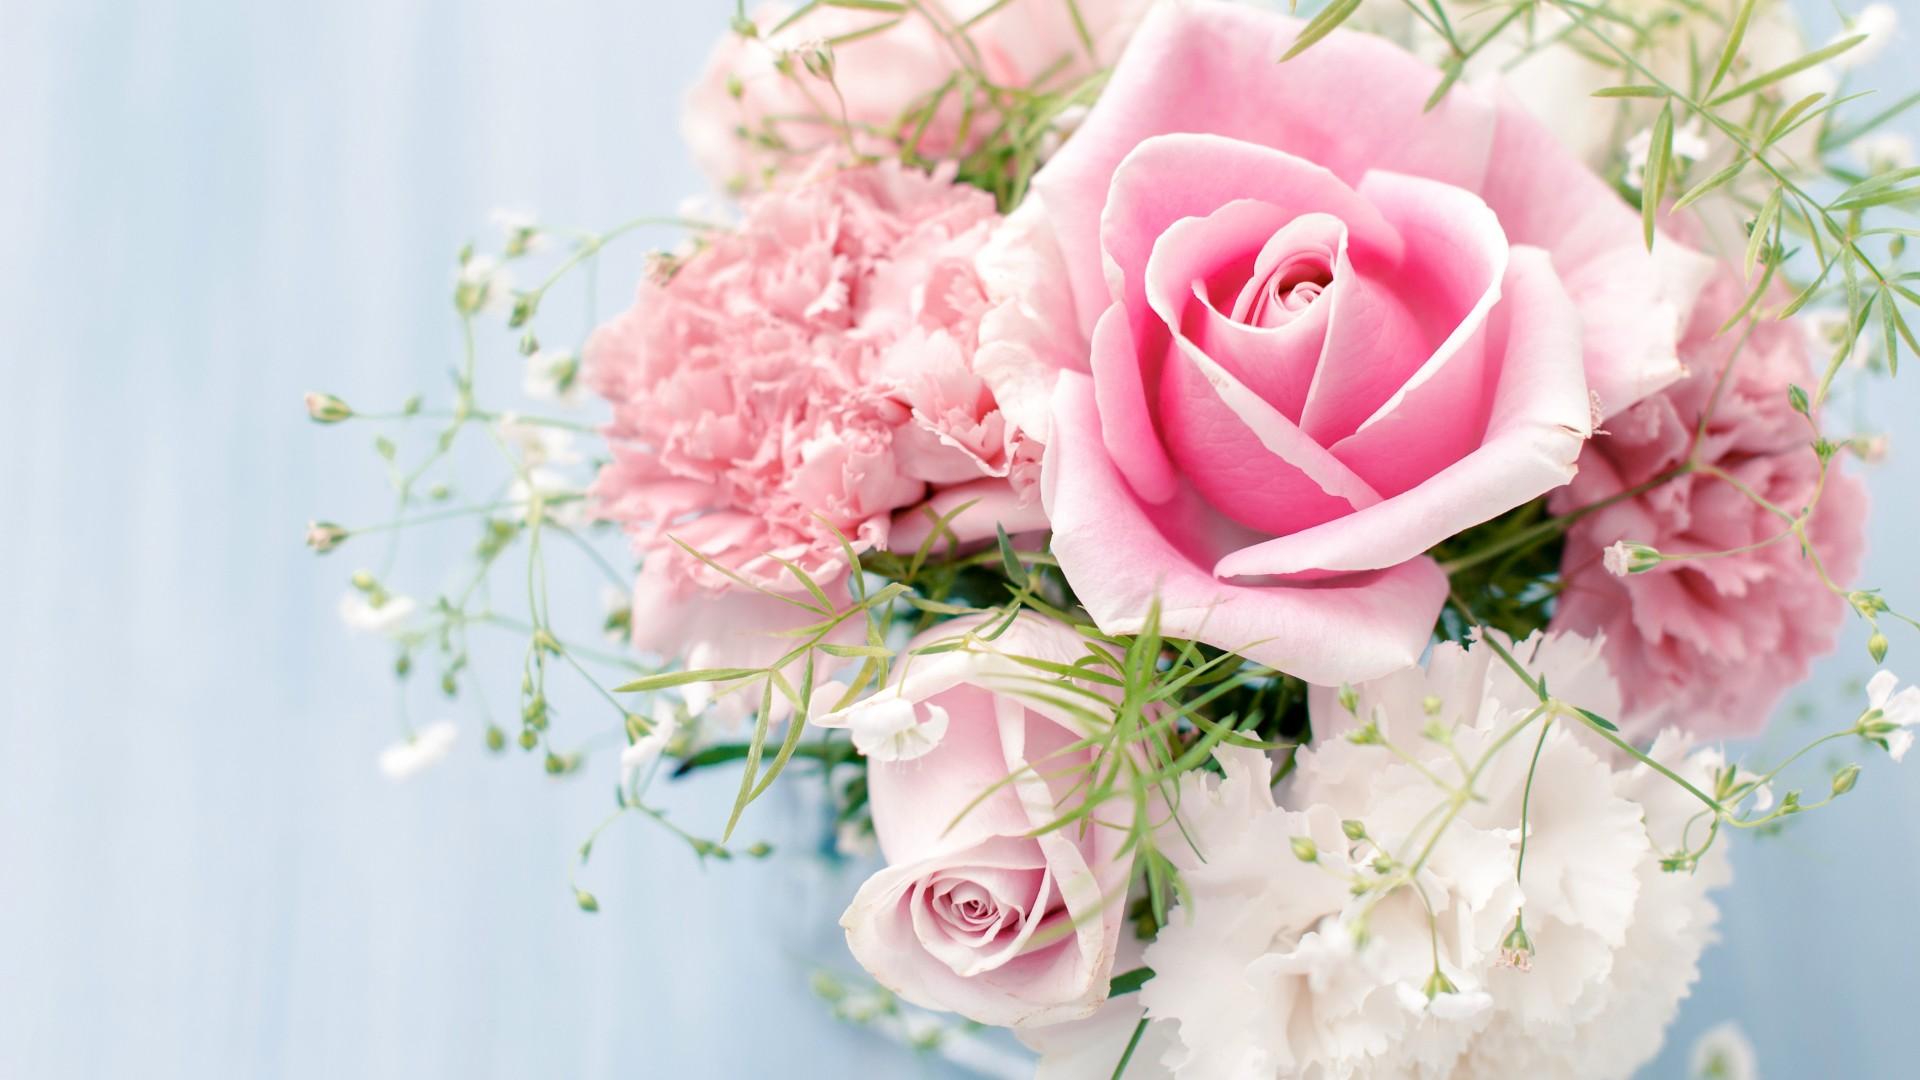 Roses - flowers Wallpaper  Roses